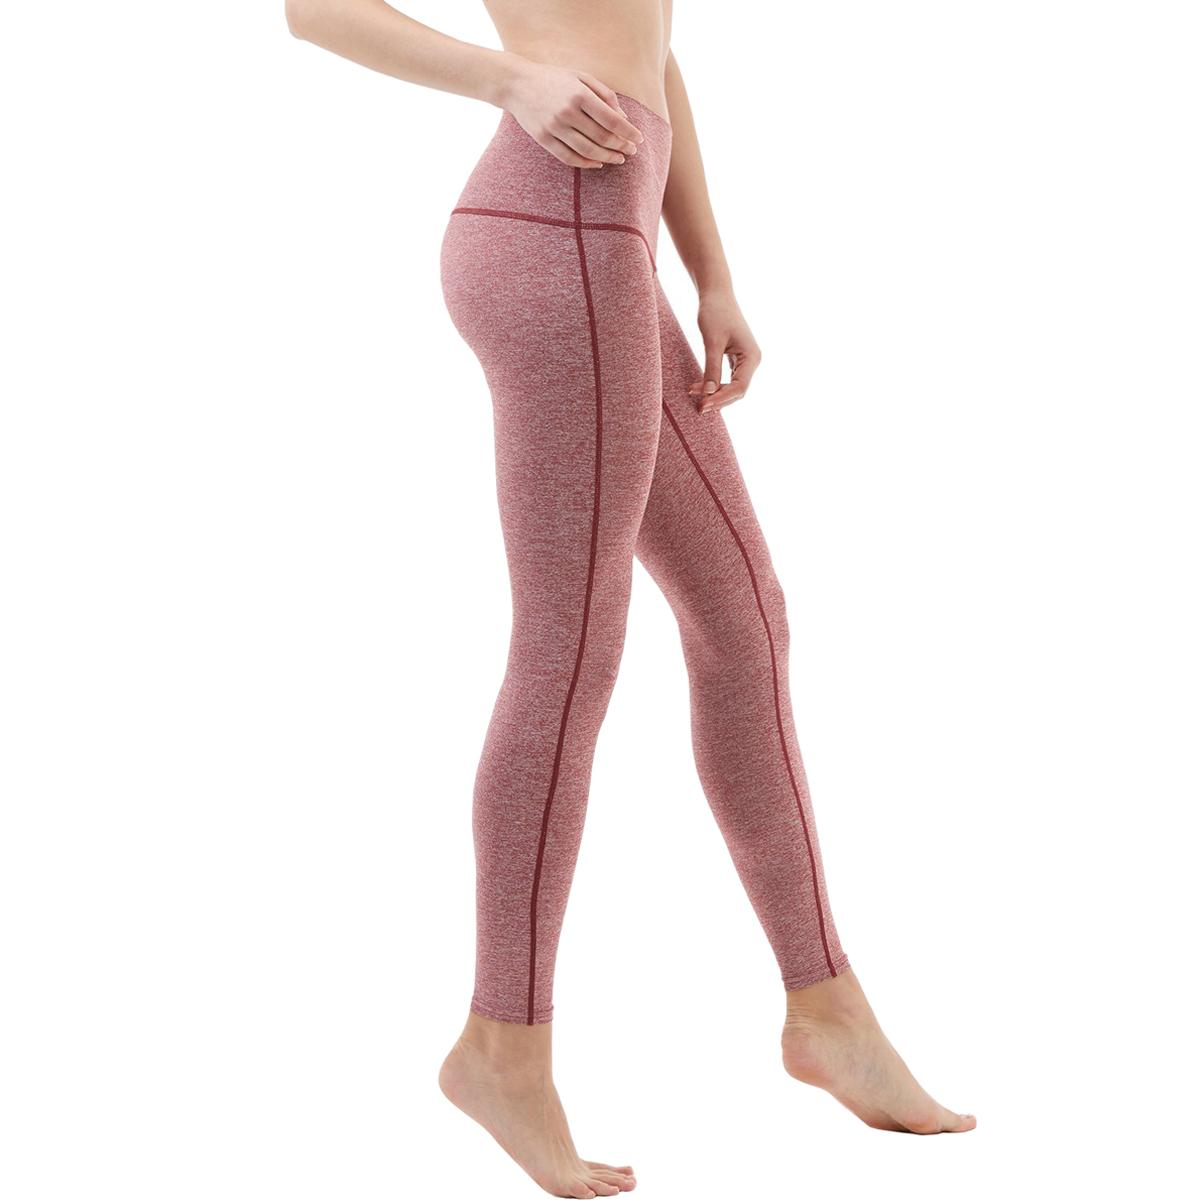 thumbnail 97 - TSLA Tesla FYP42 Women's High-Waisted Ultra-Stretch Tummy Control Yoga Pants